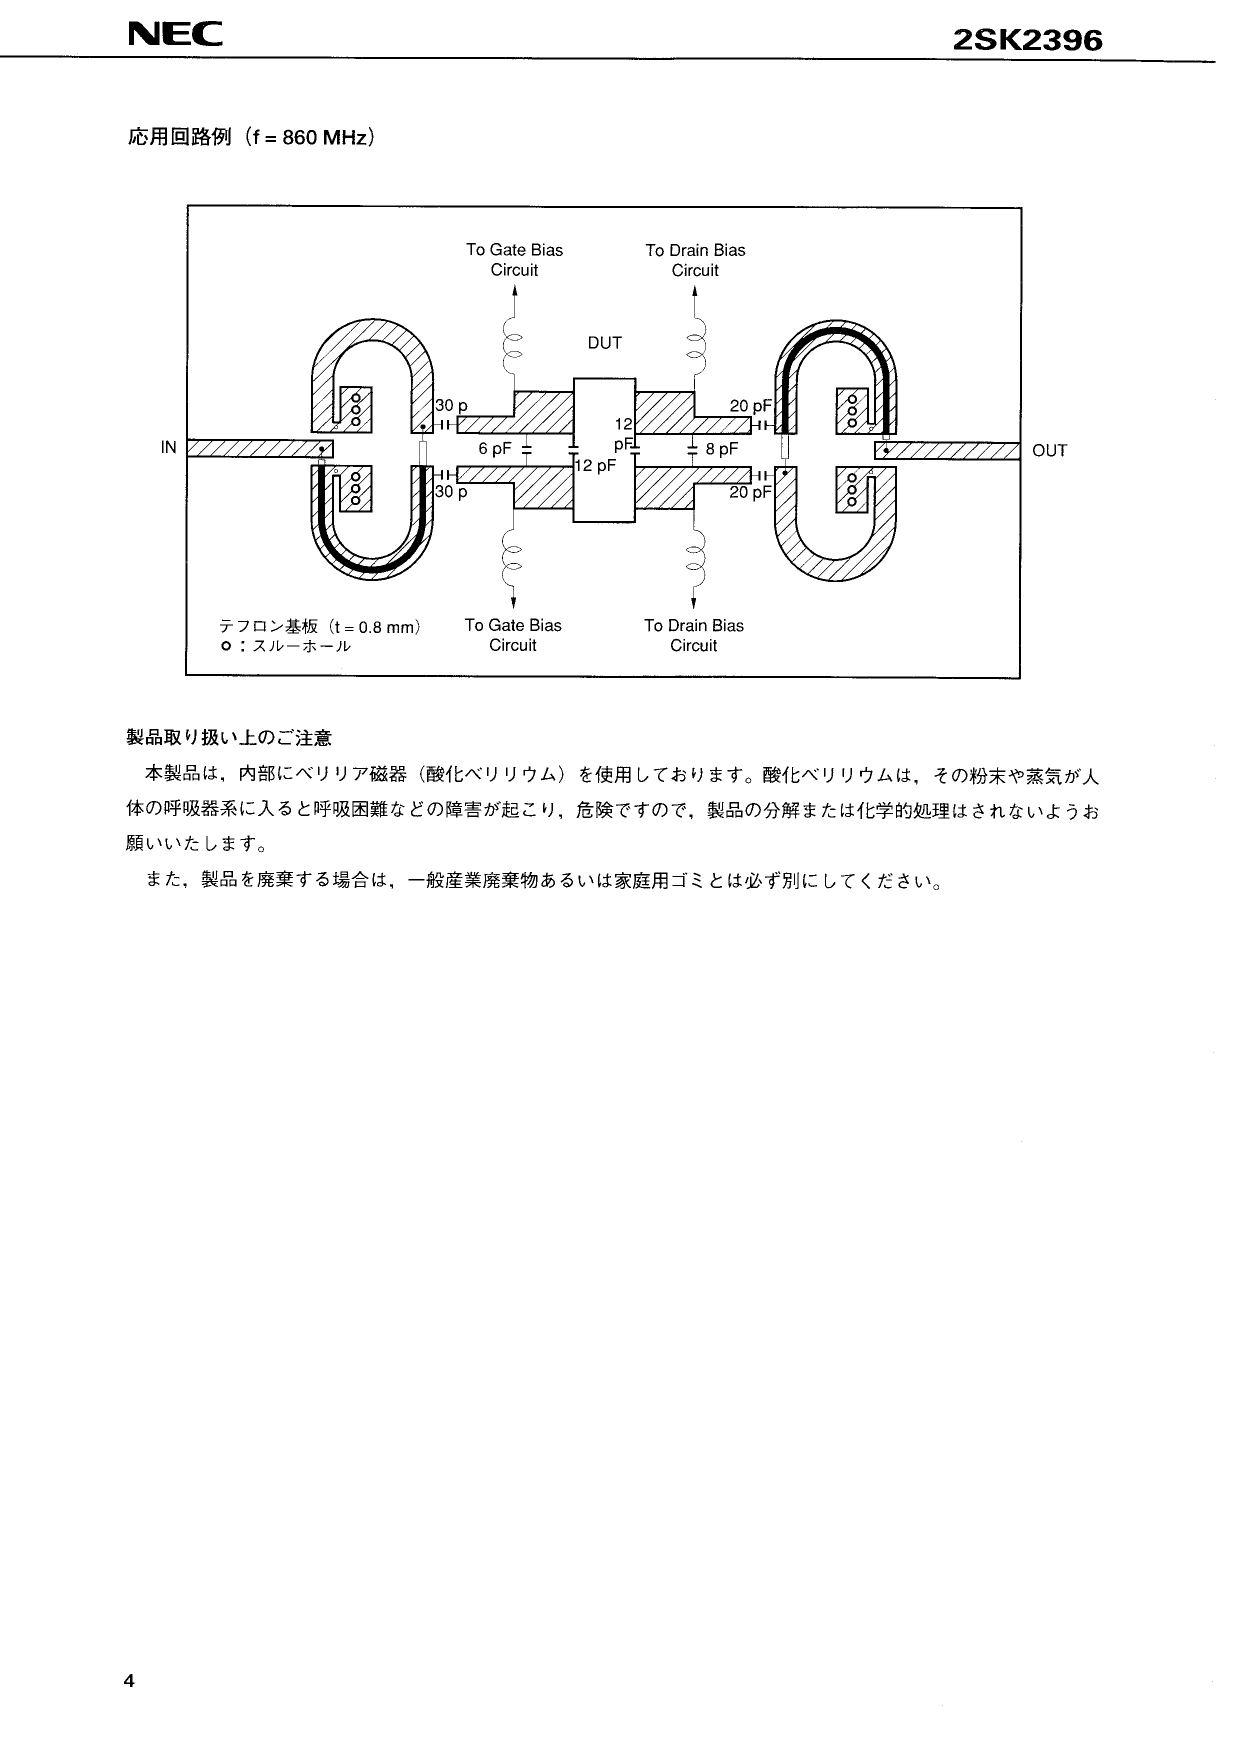 2SK2396 pdf, 전자부품, 반도체, 판매, 대치품